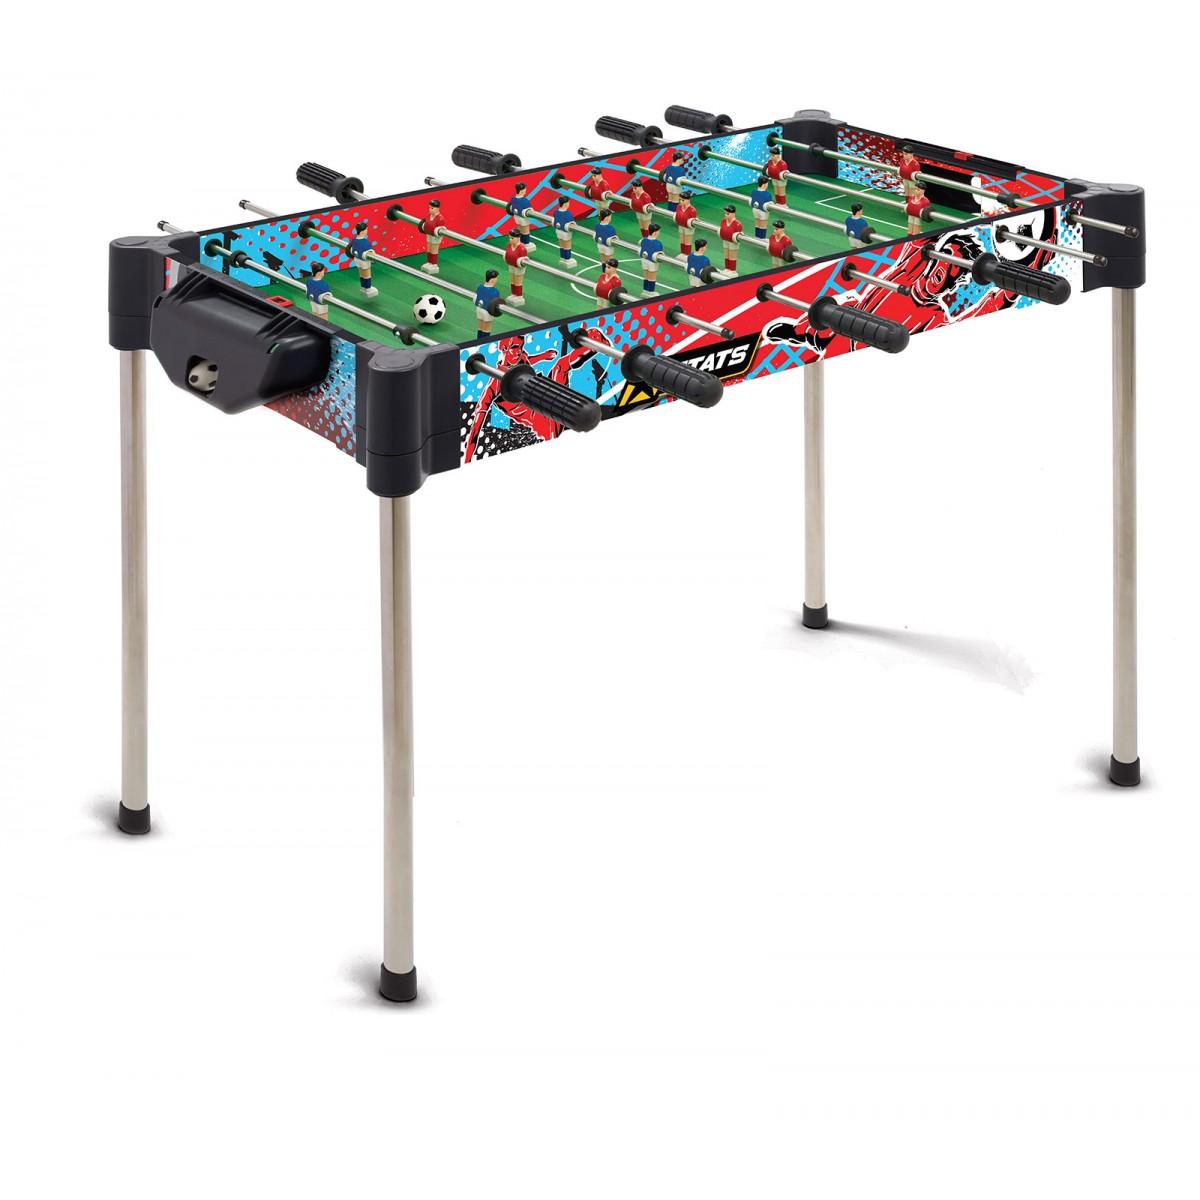 "STATS 32"" (82cm) Foosball Table"